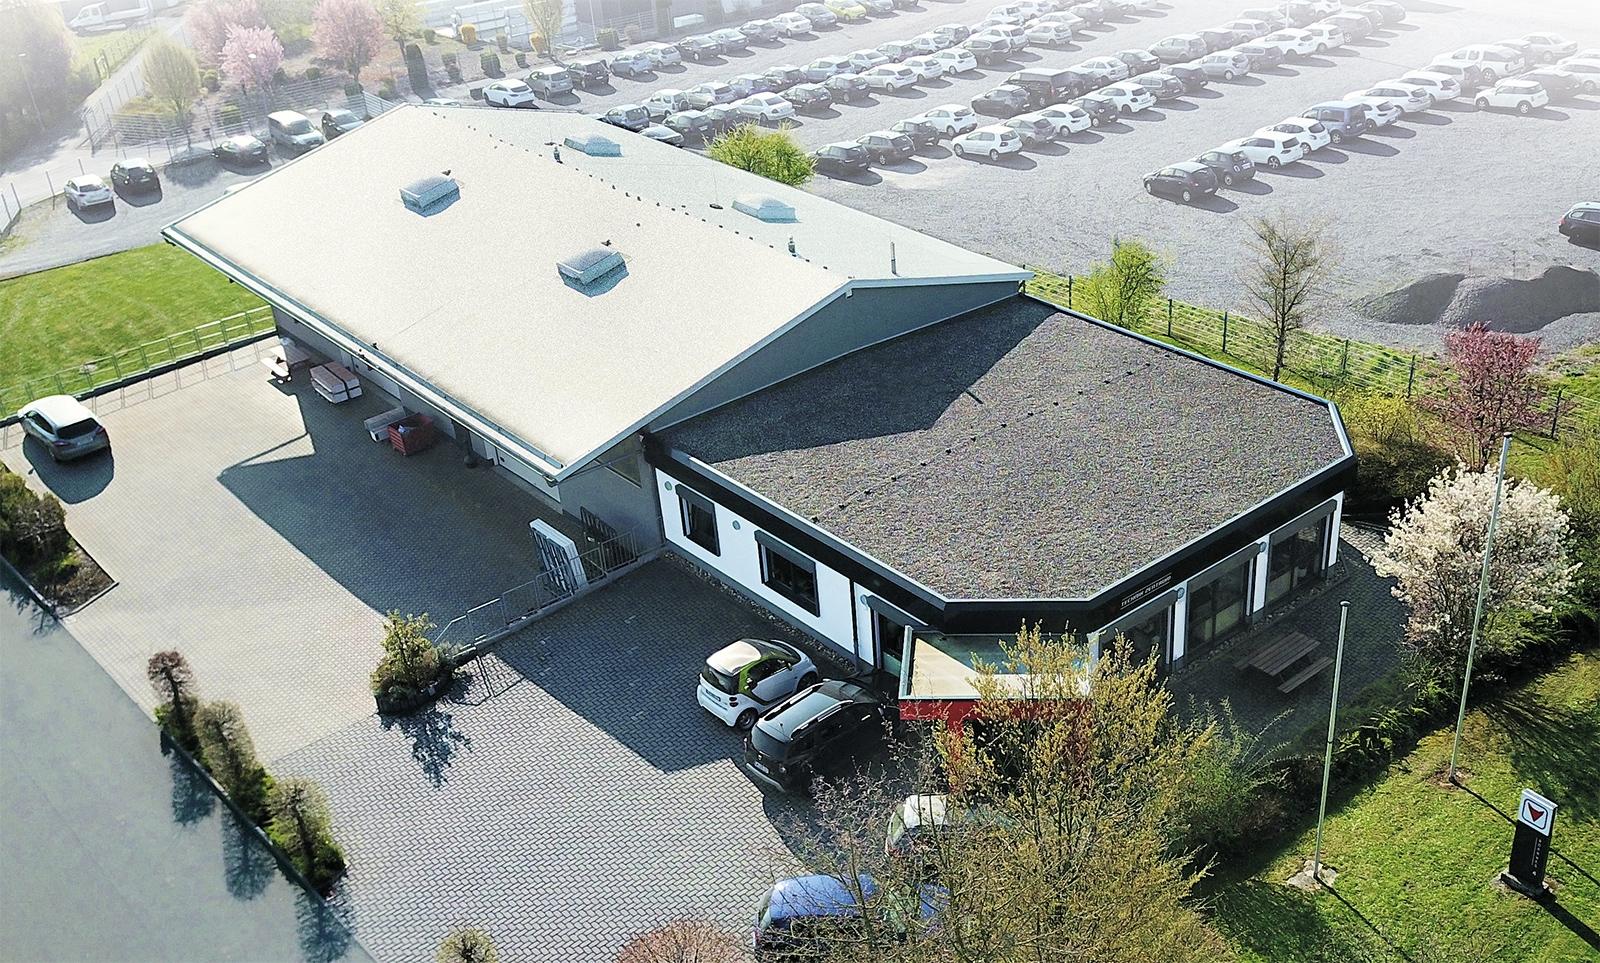 Beck+Heun Zentrale Mengerskirchen Technik- und Prüfzentrum